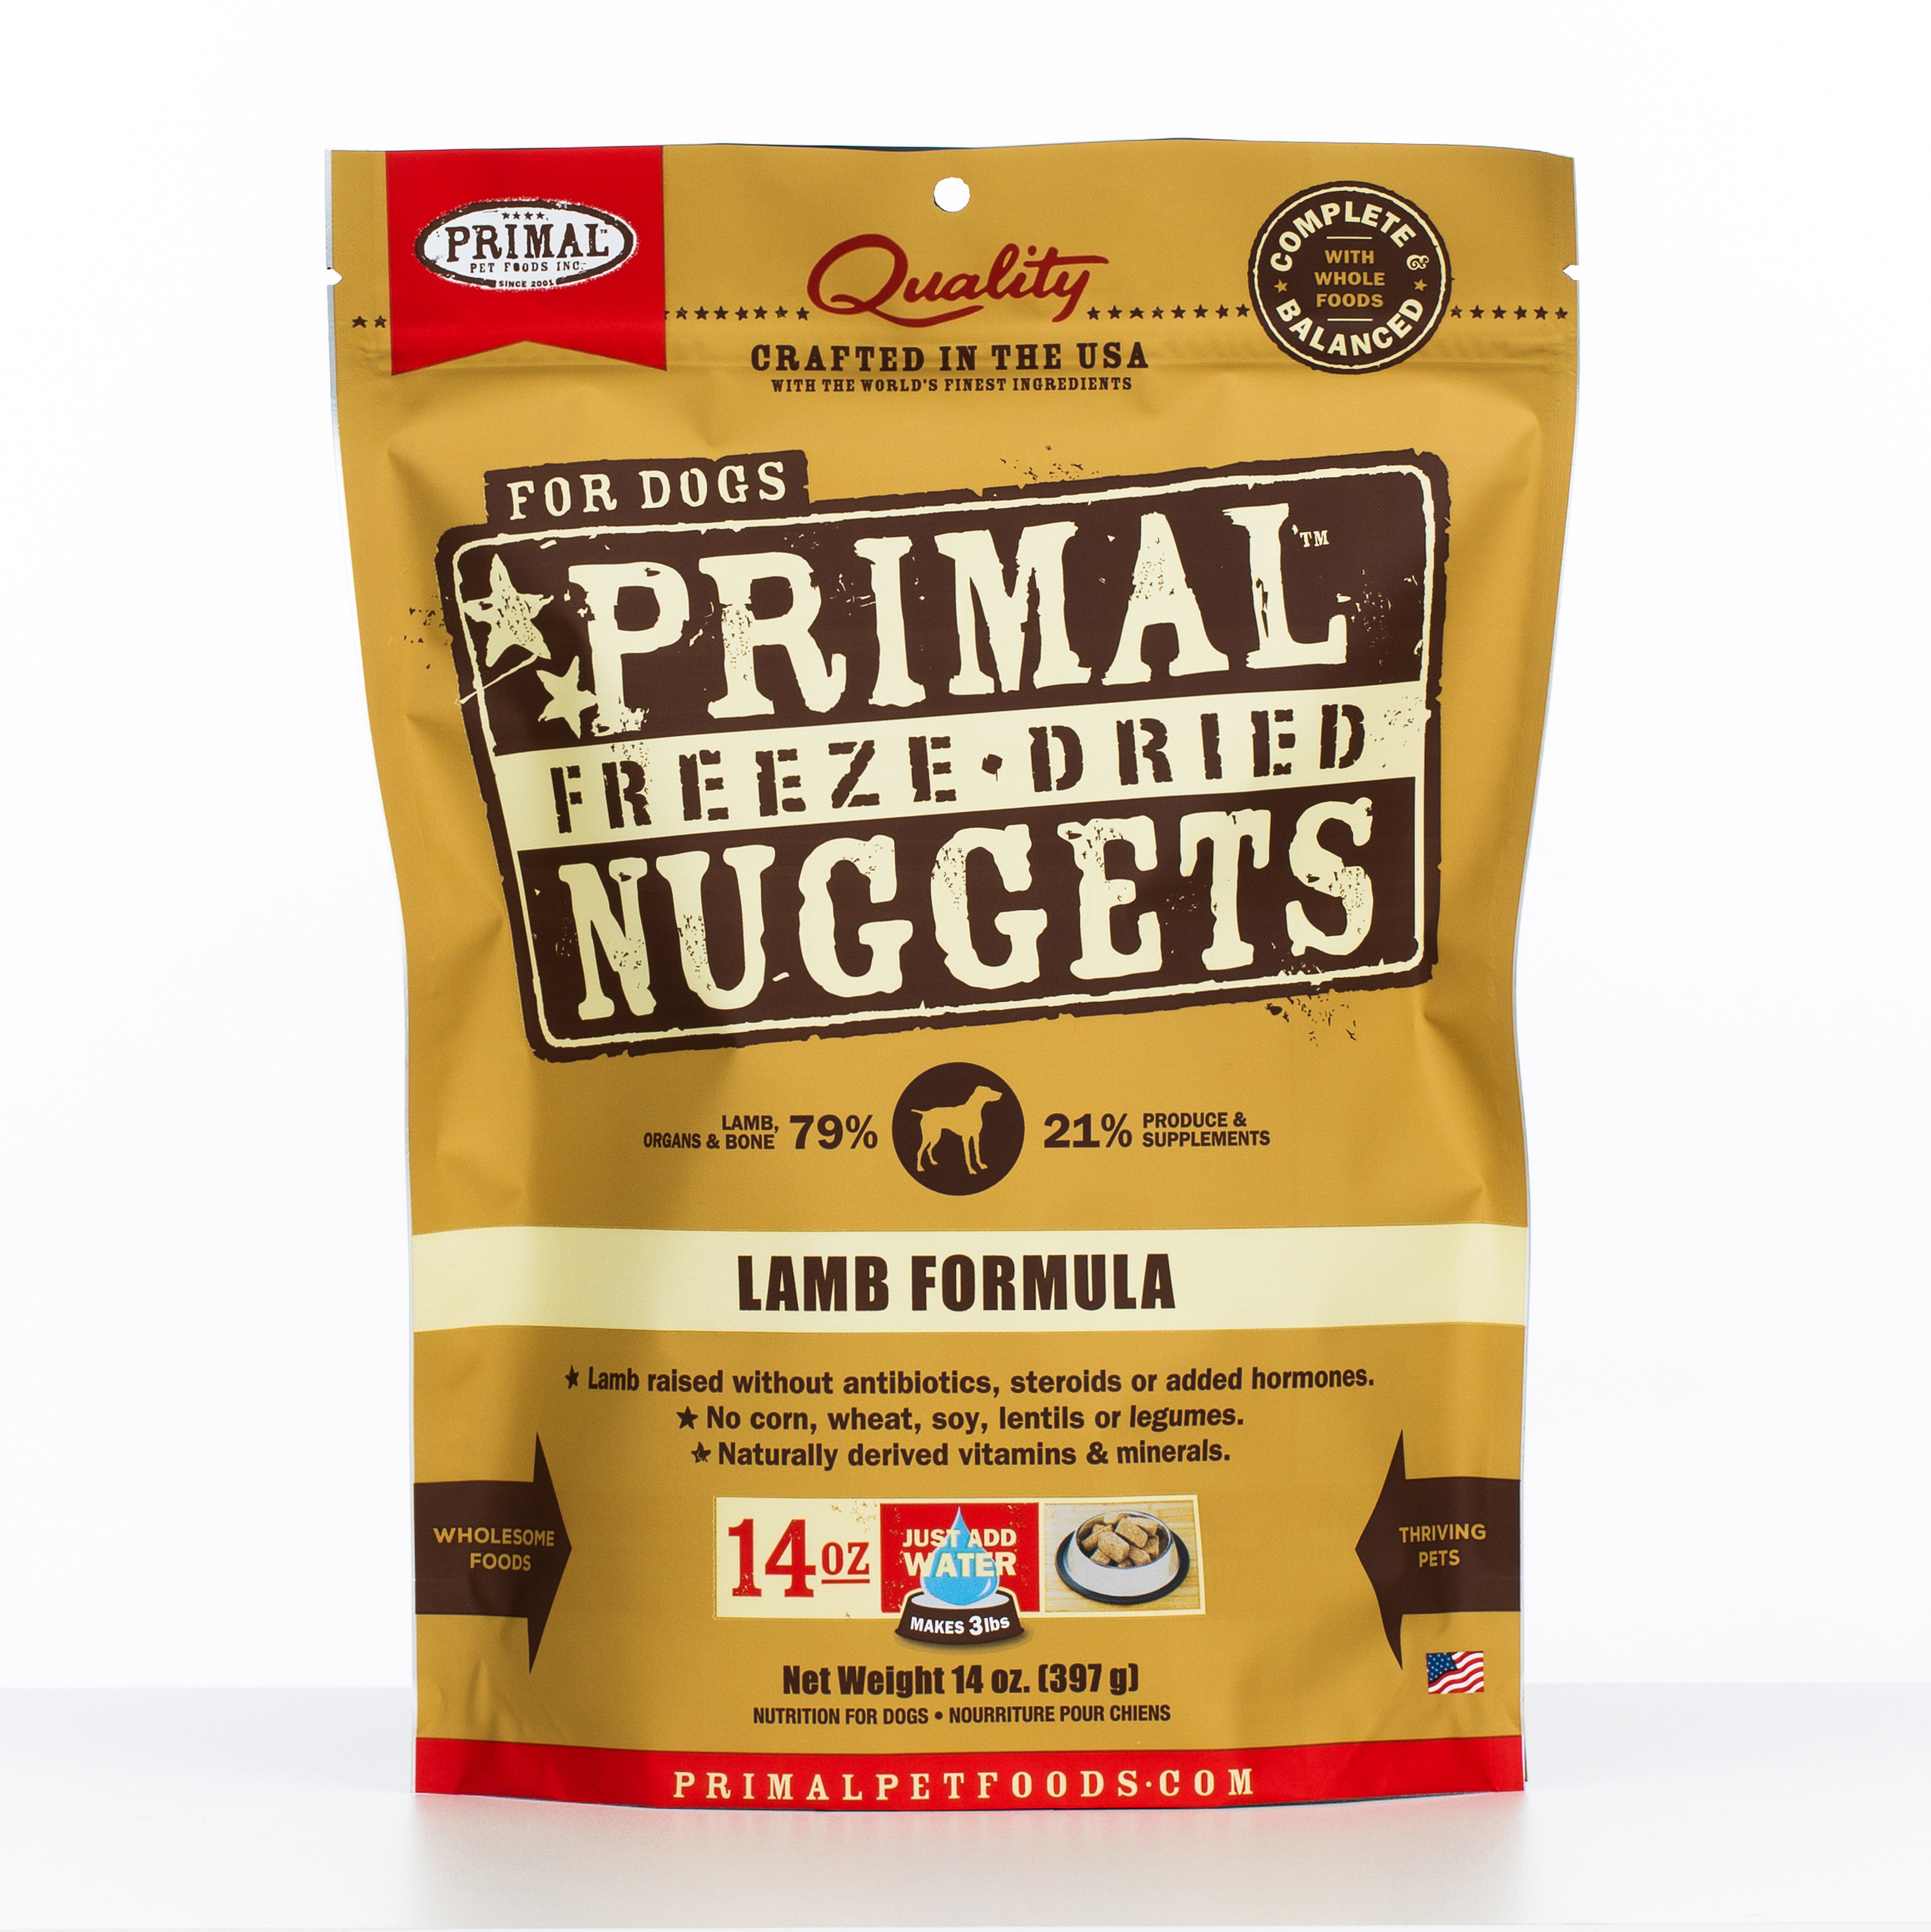 Primal Raw Freeze-Dried Nuggets Lamb Formula Dog Food, 14-oz bag